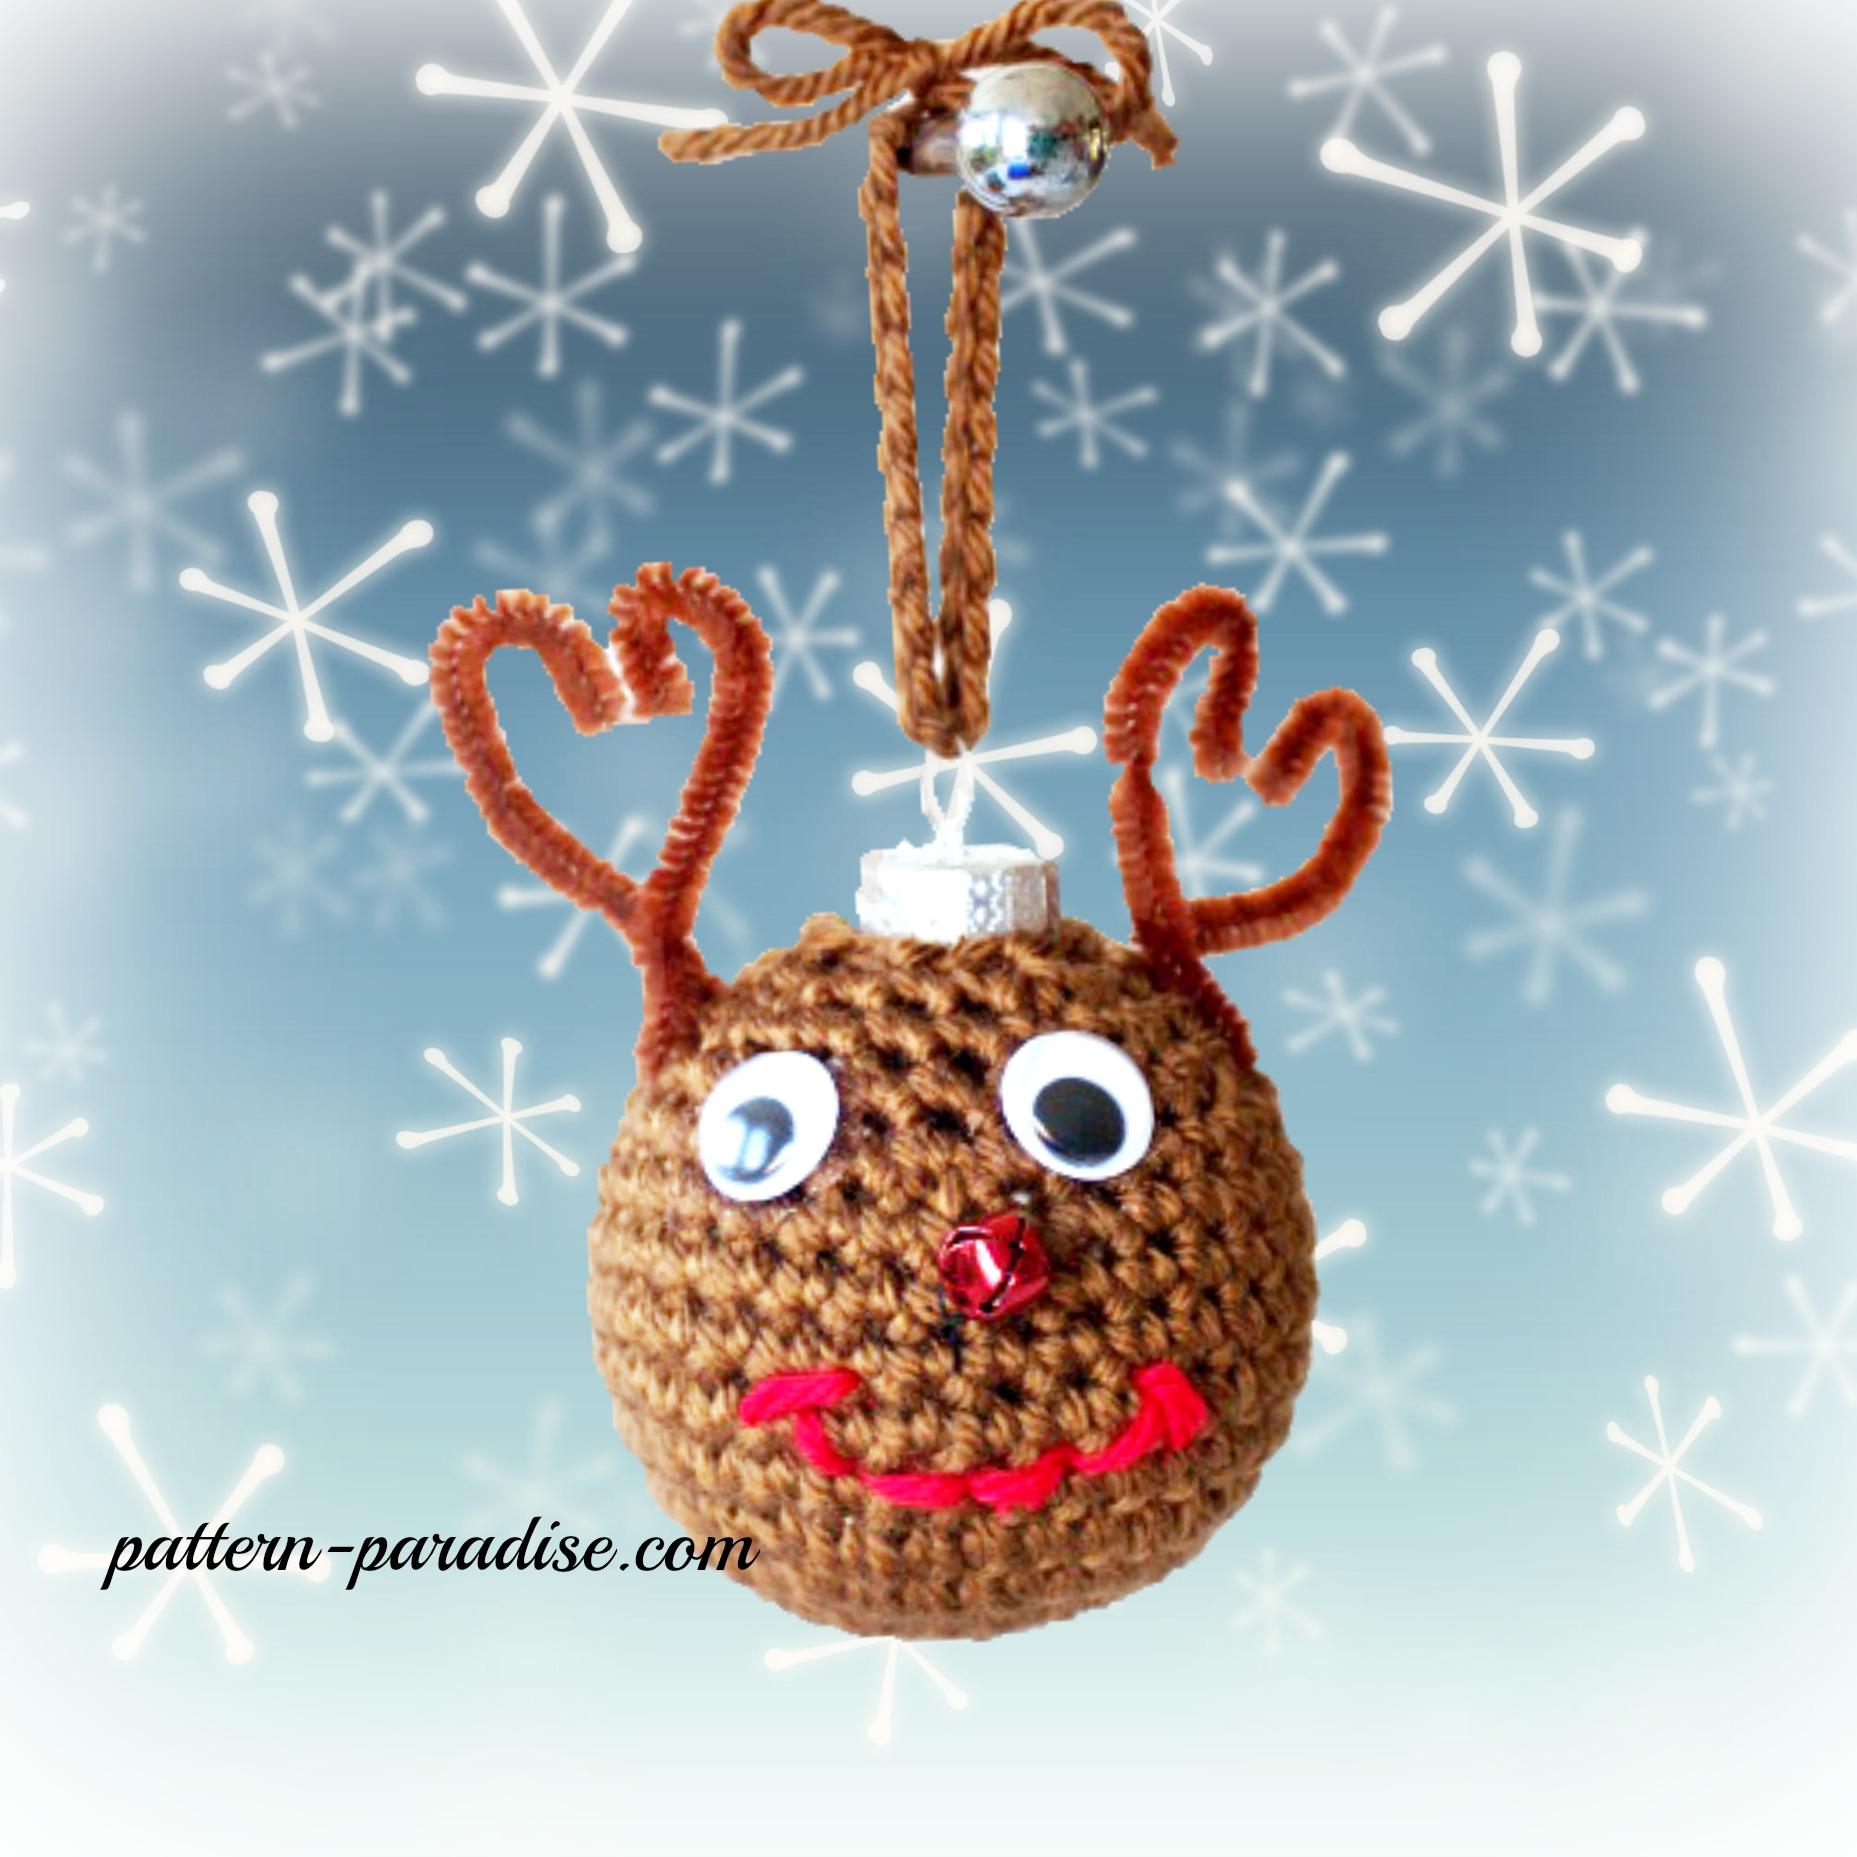 Free Crochet Pattern: Christmas Tree Ornaments | Pattern ...